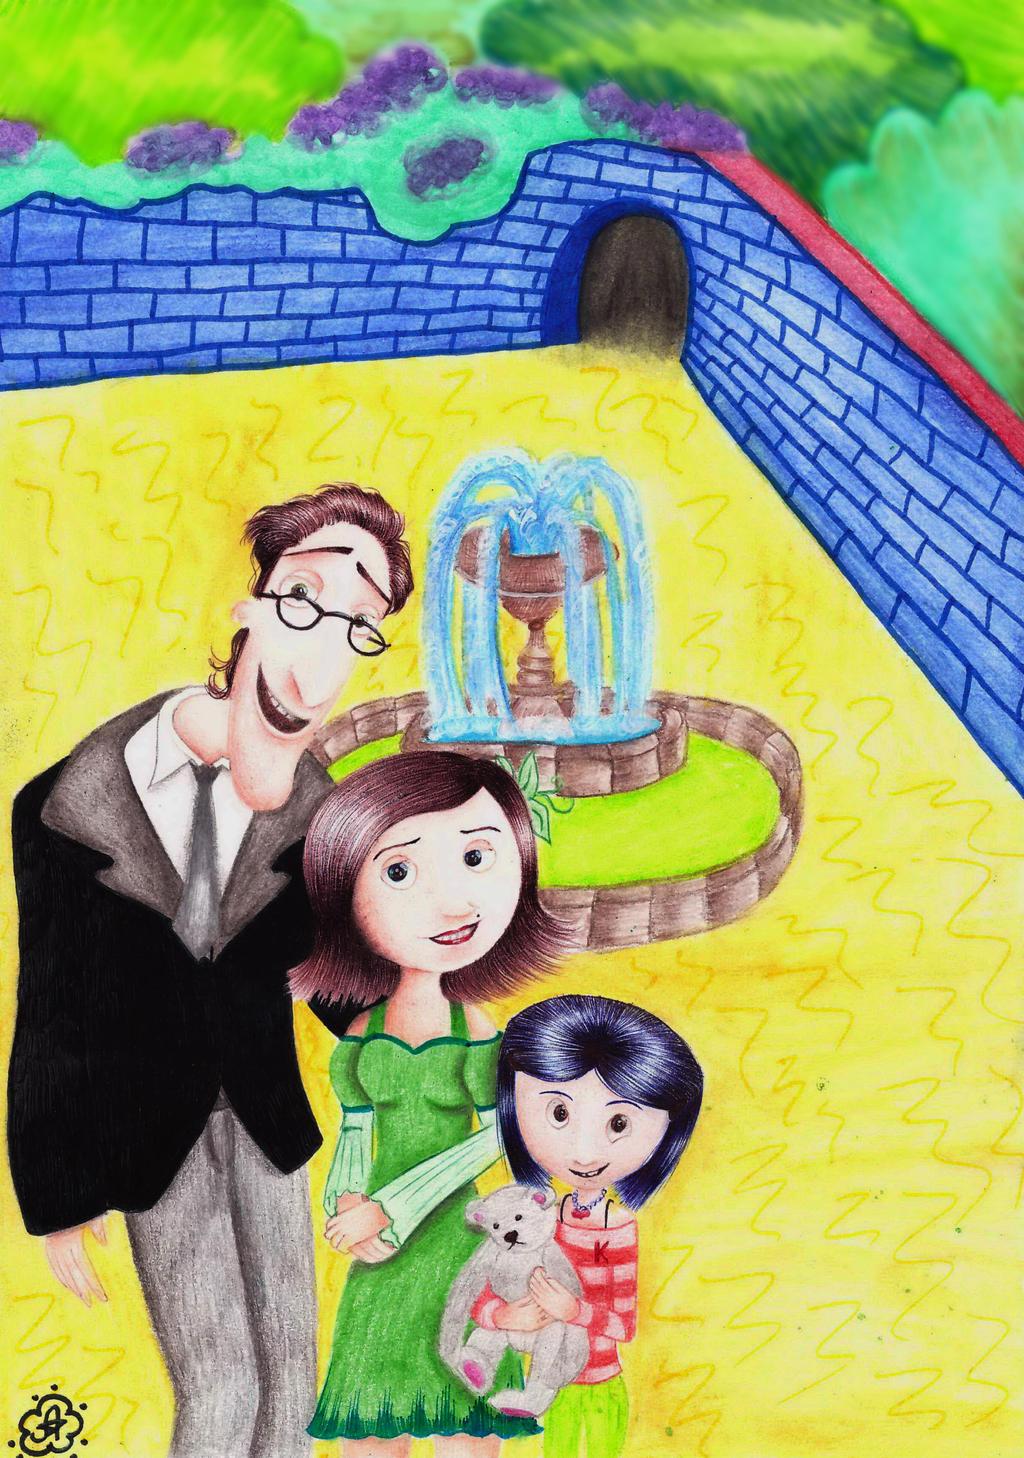 Coraline My Family By 7 Annita 7 On Deviantart